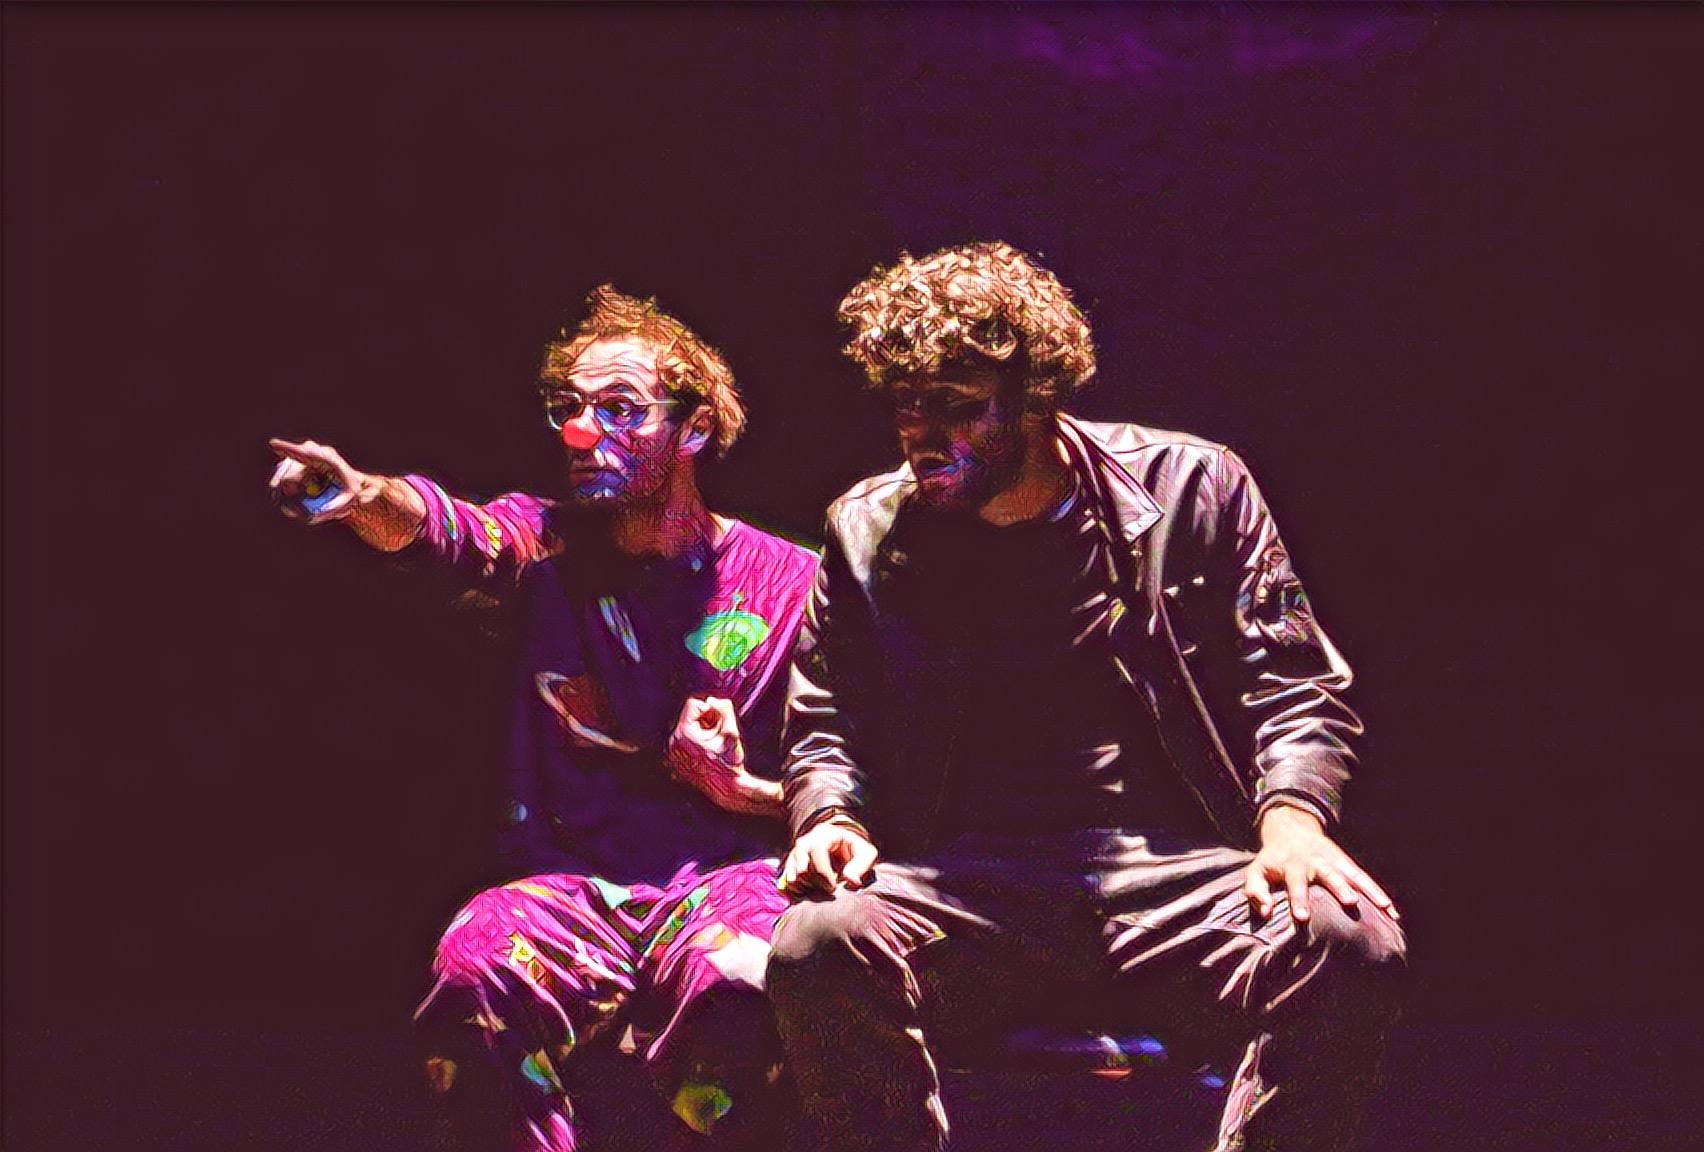 LE_TEMPS_SE_FIGE_Collectif_Theatre_La_Capsule.jpg